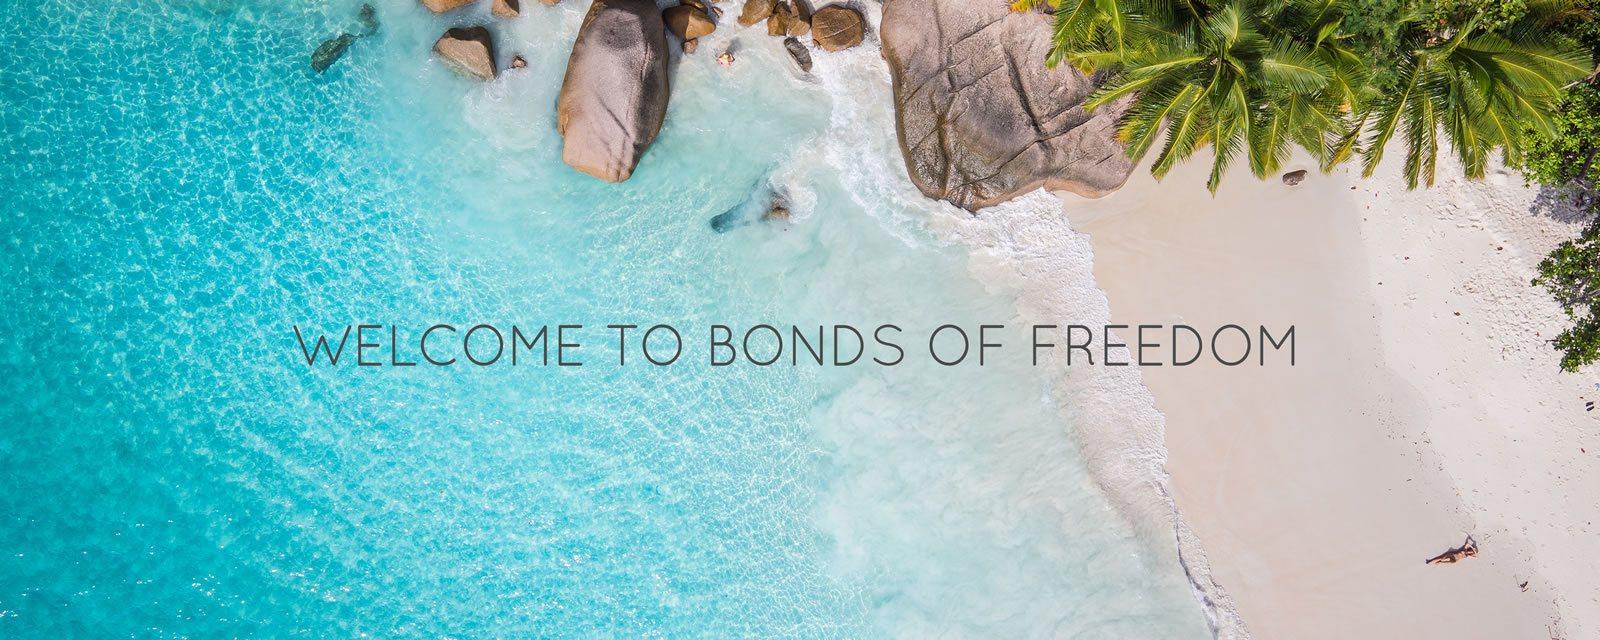 Freedom Bonds Slider 1